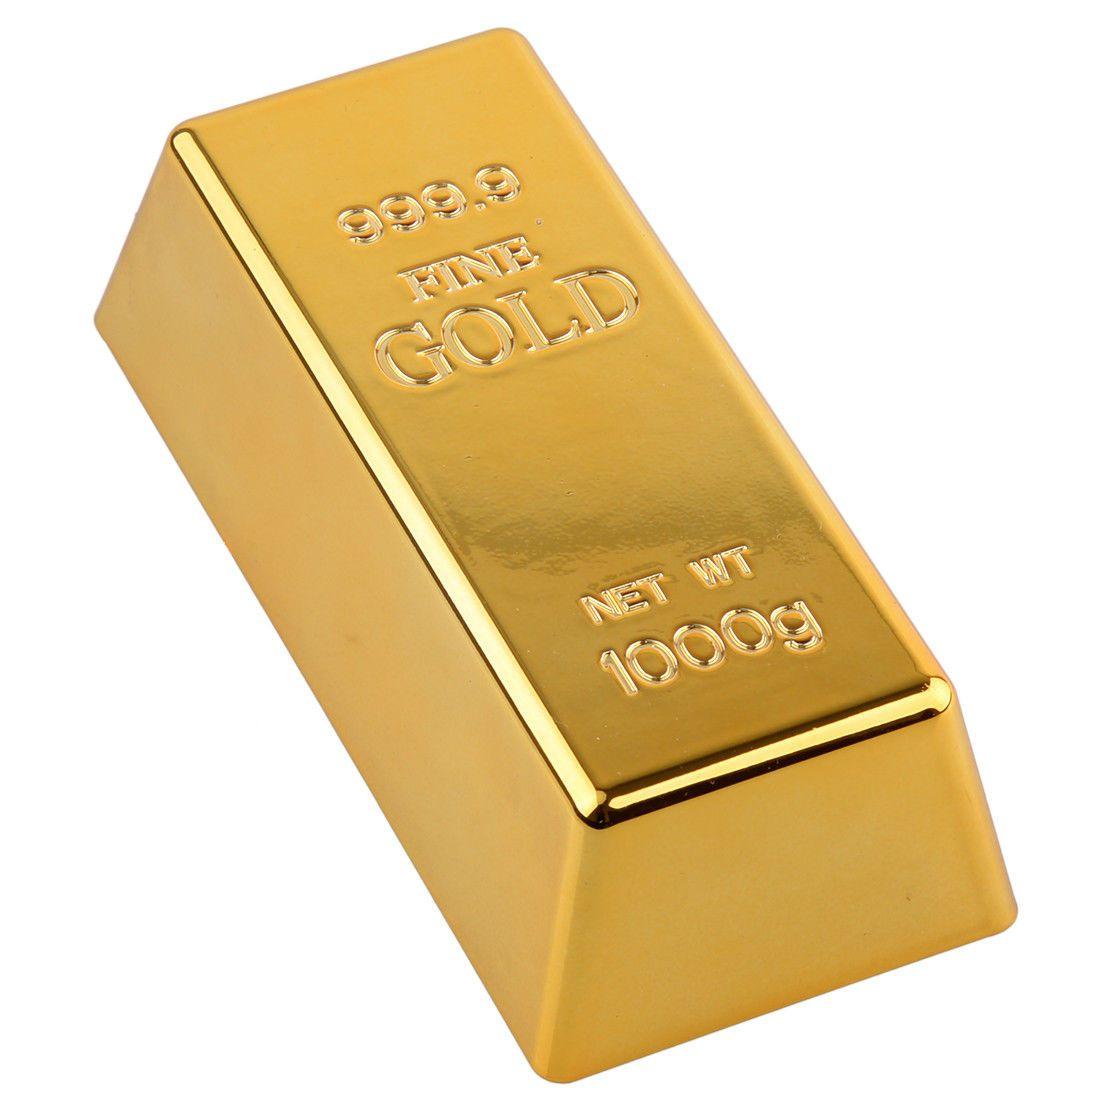 6 5 Fake Gold Bar Brick Bullion Door Stop Paperweight Desk Office Home Decor